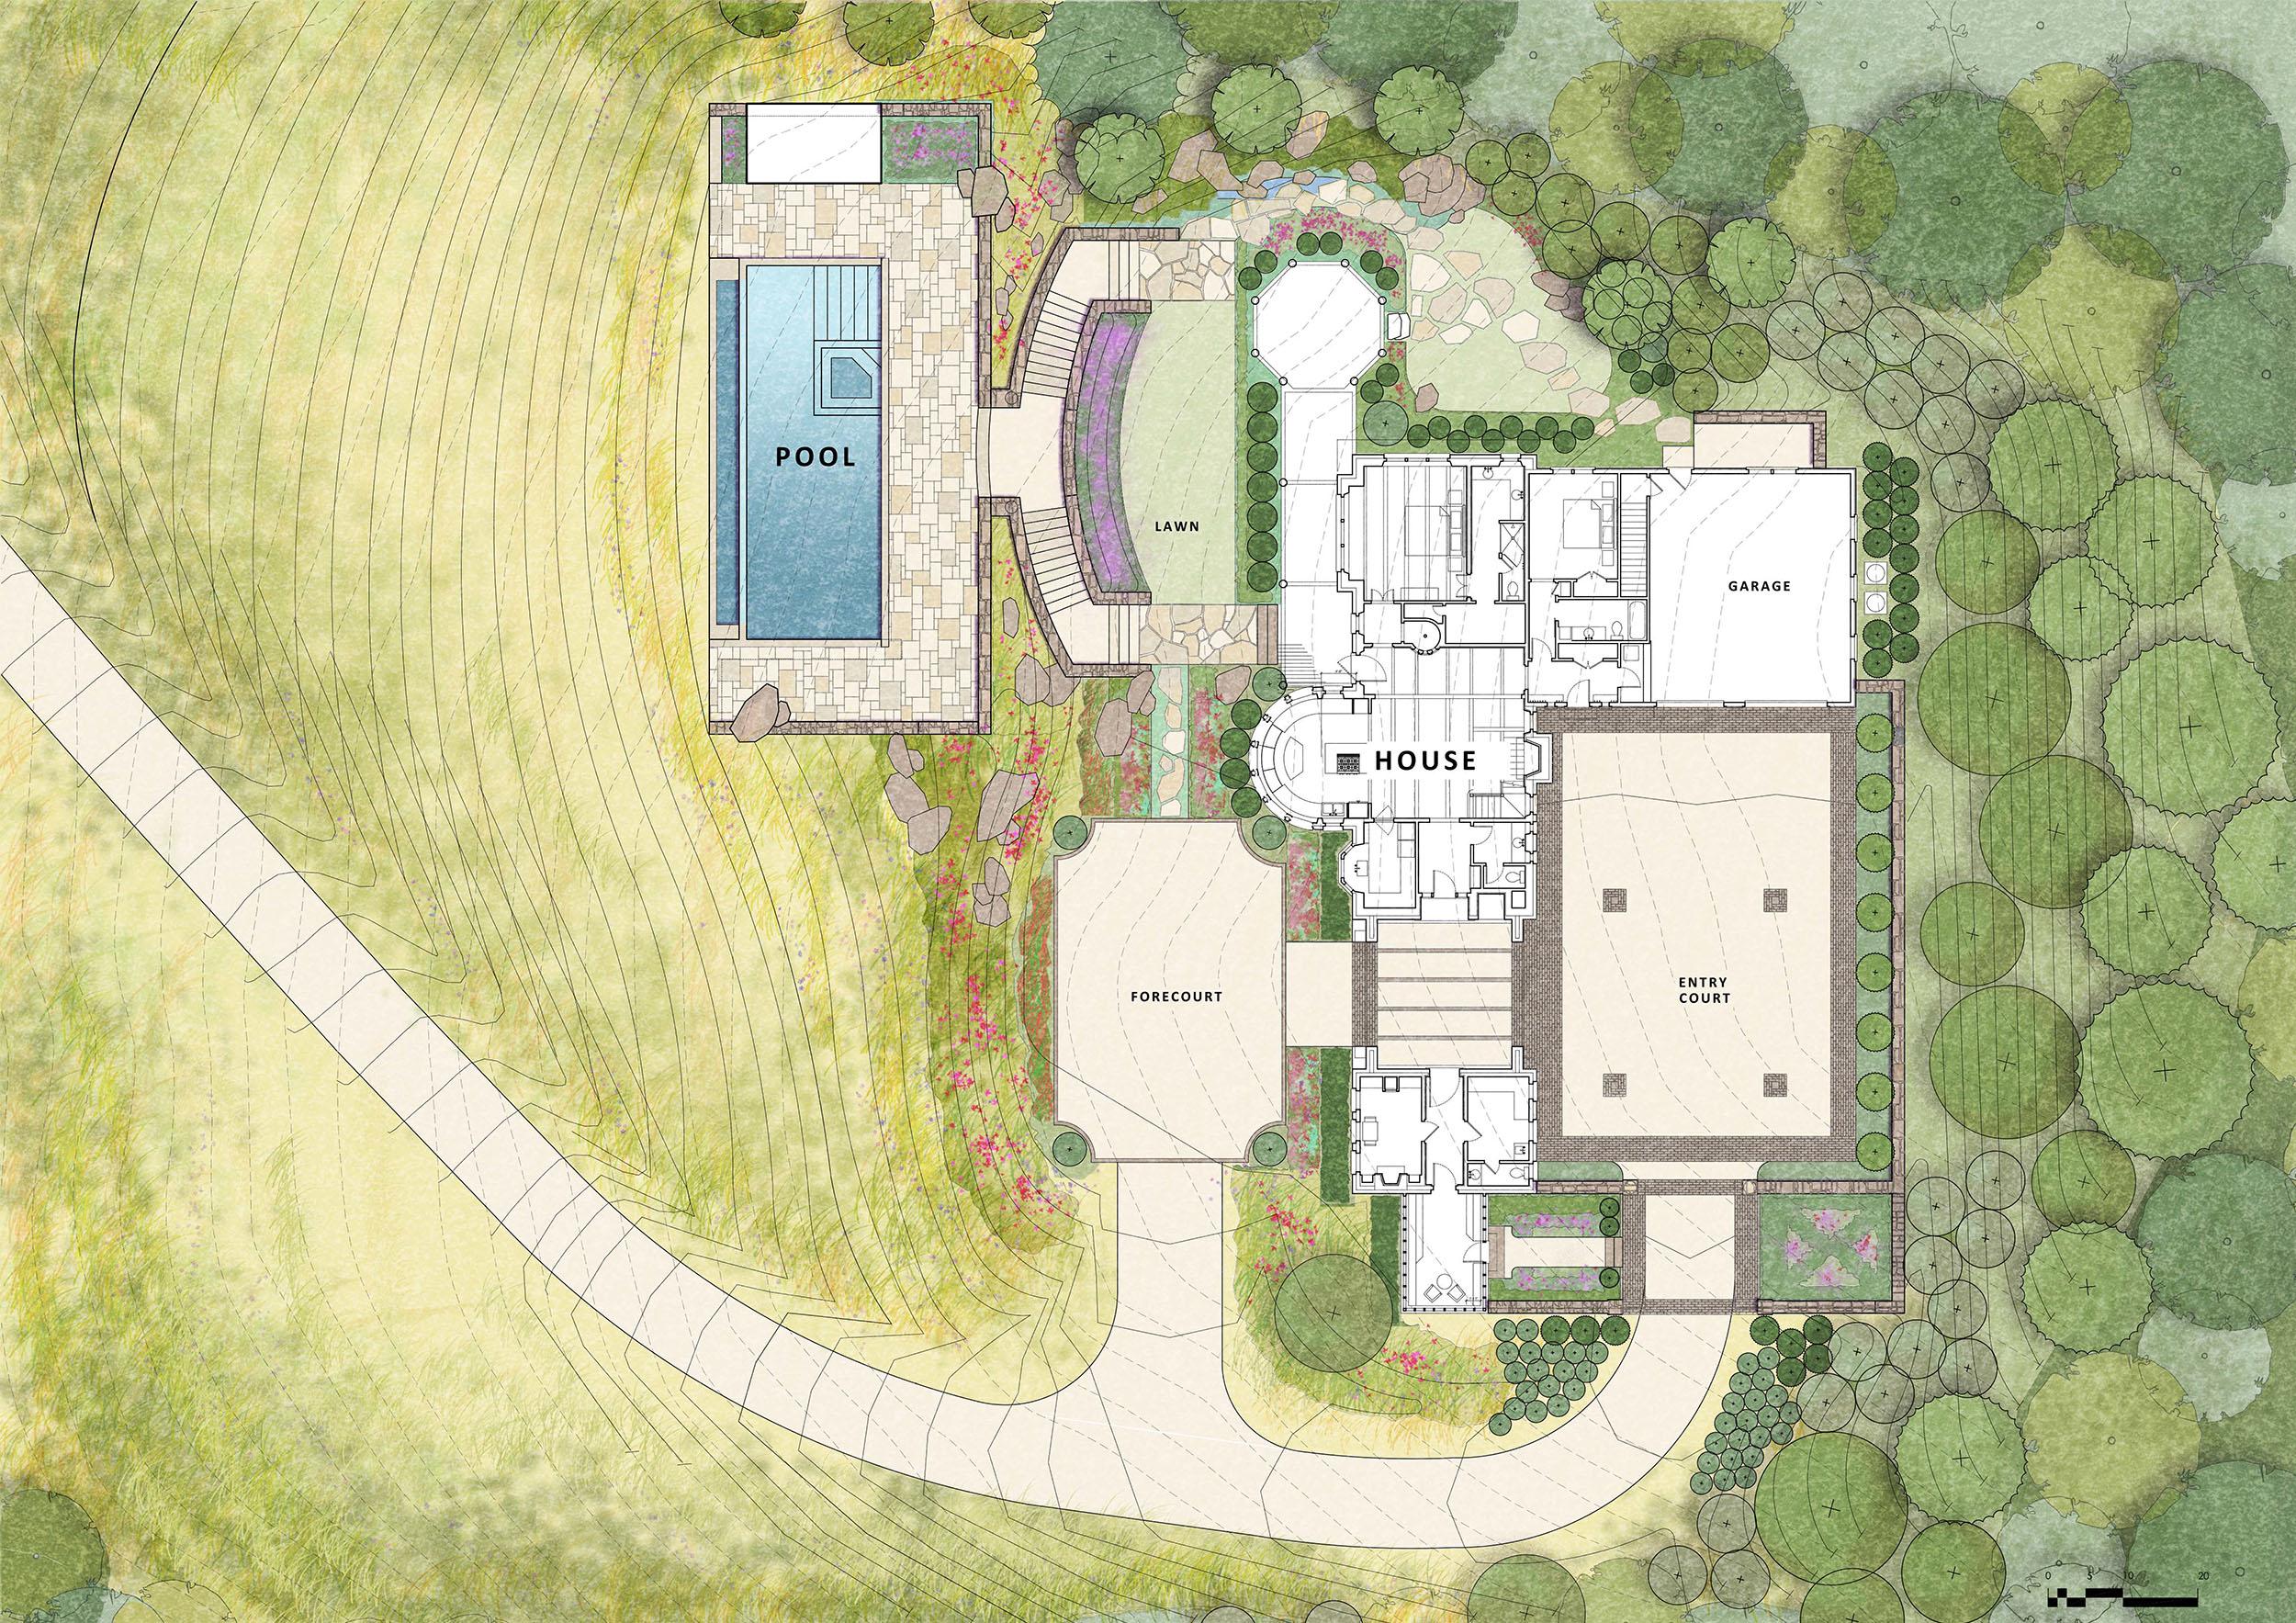 Master-plan-drawing_Grounded_charlottesville-landscape-architect.jpg